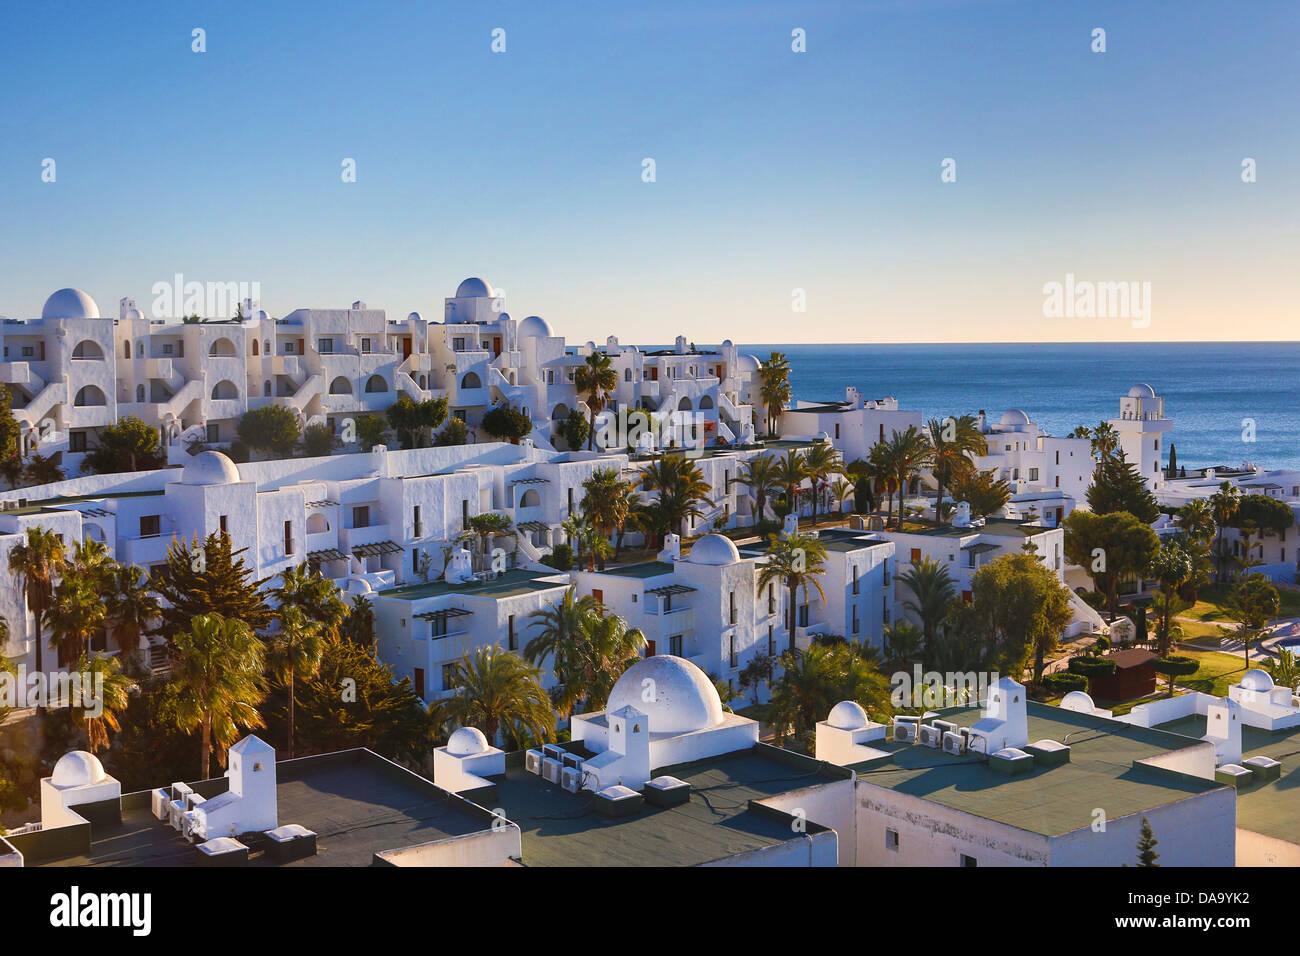 Spain, Europe, Andalusia, beach, coast, buildings, Mediterranean, new, palm, sea, touristic, trees, white - Stock Image